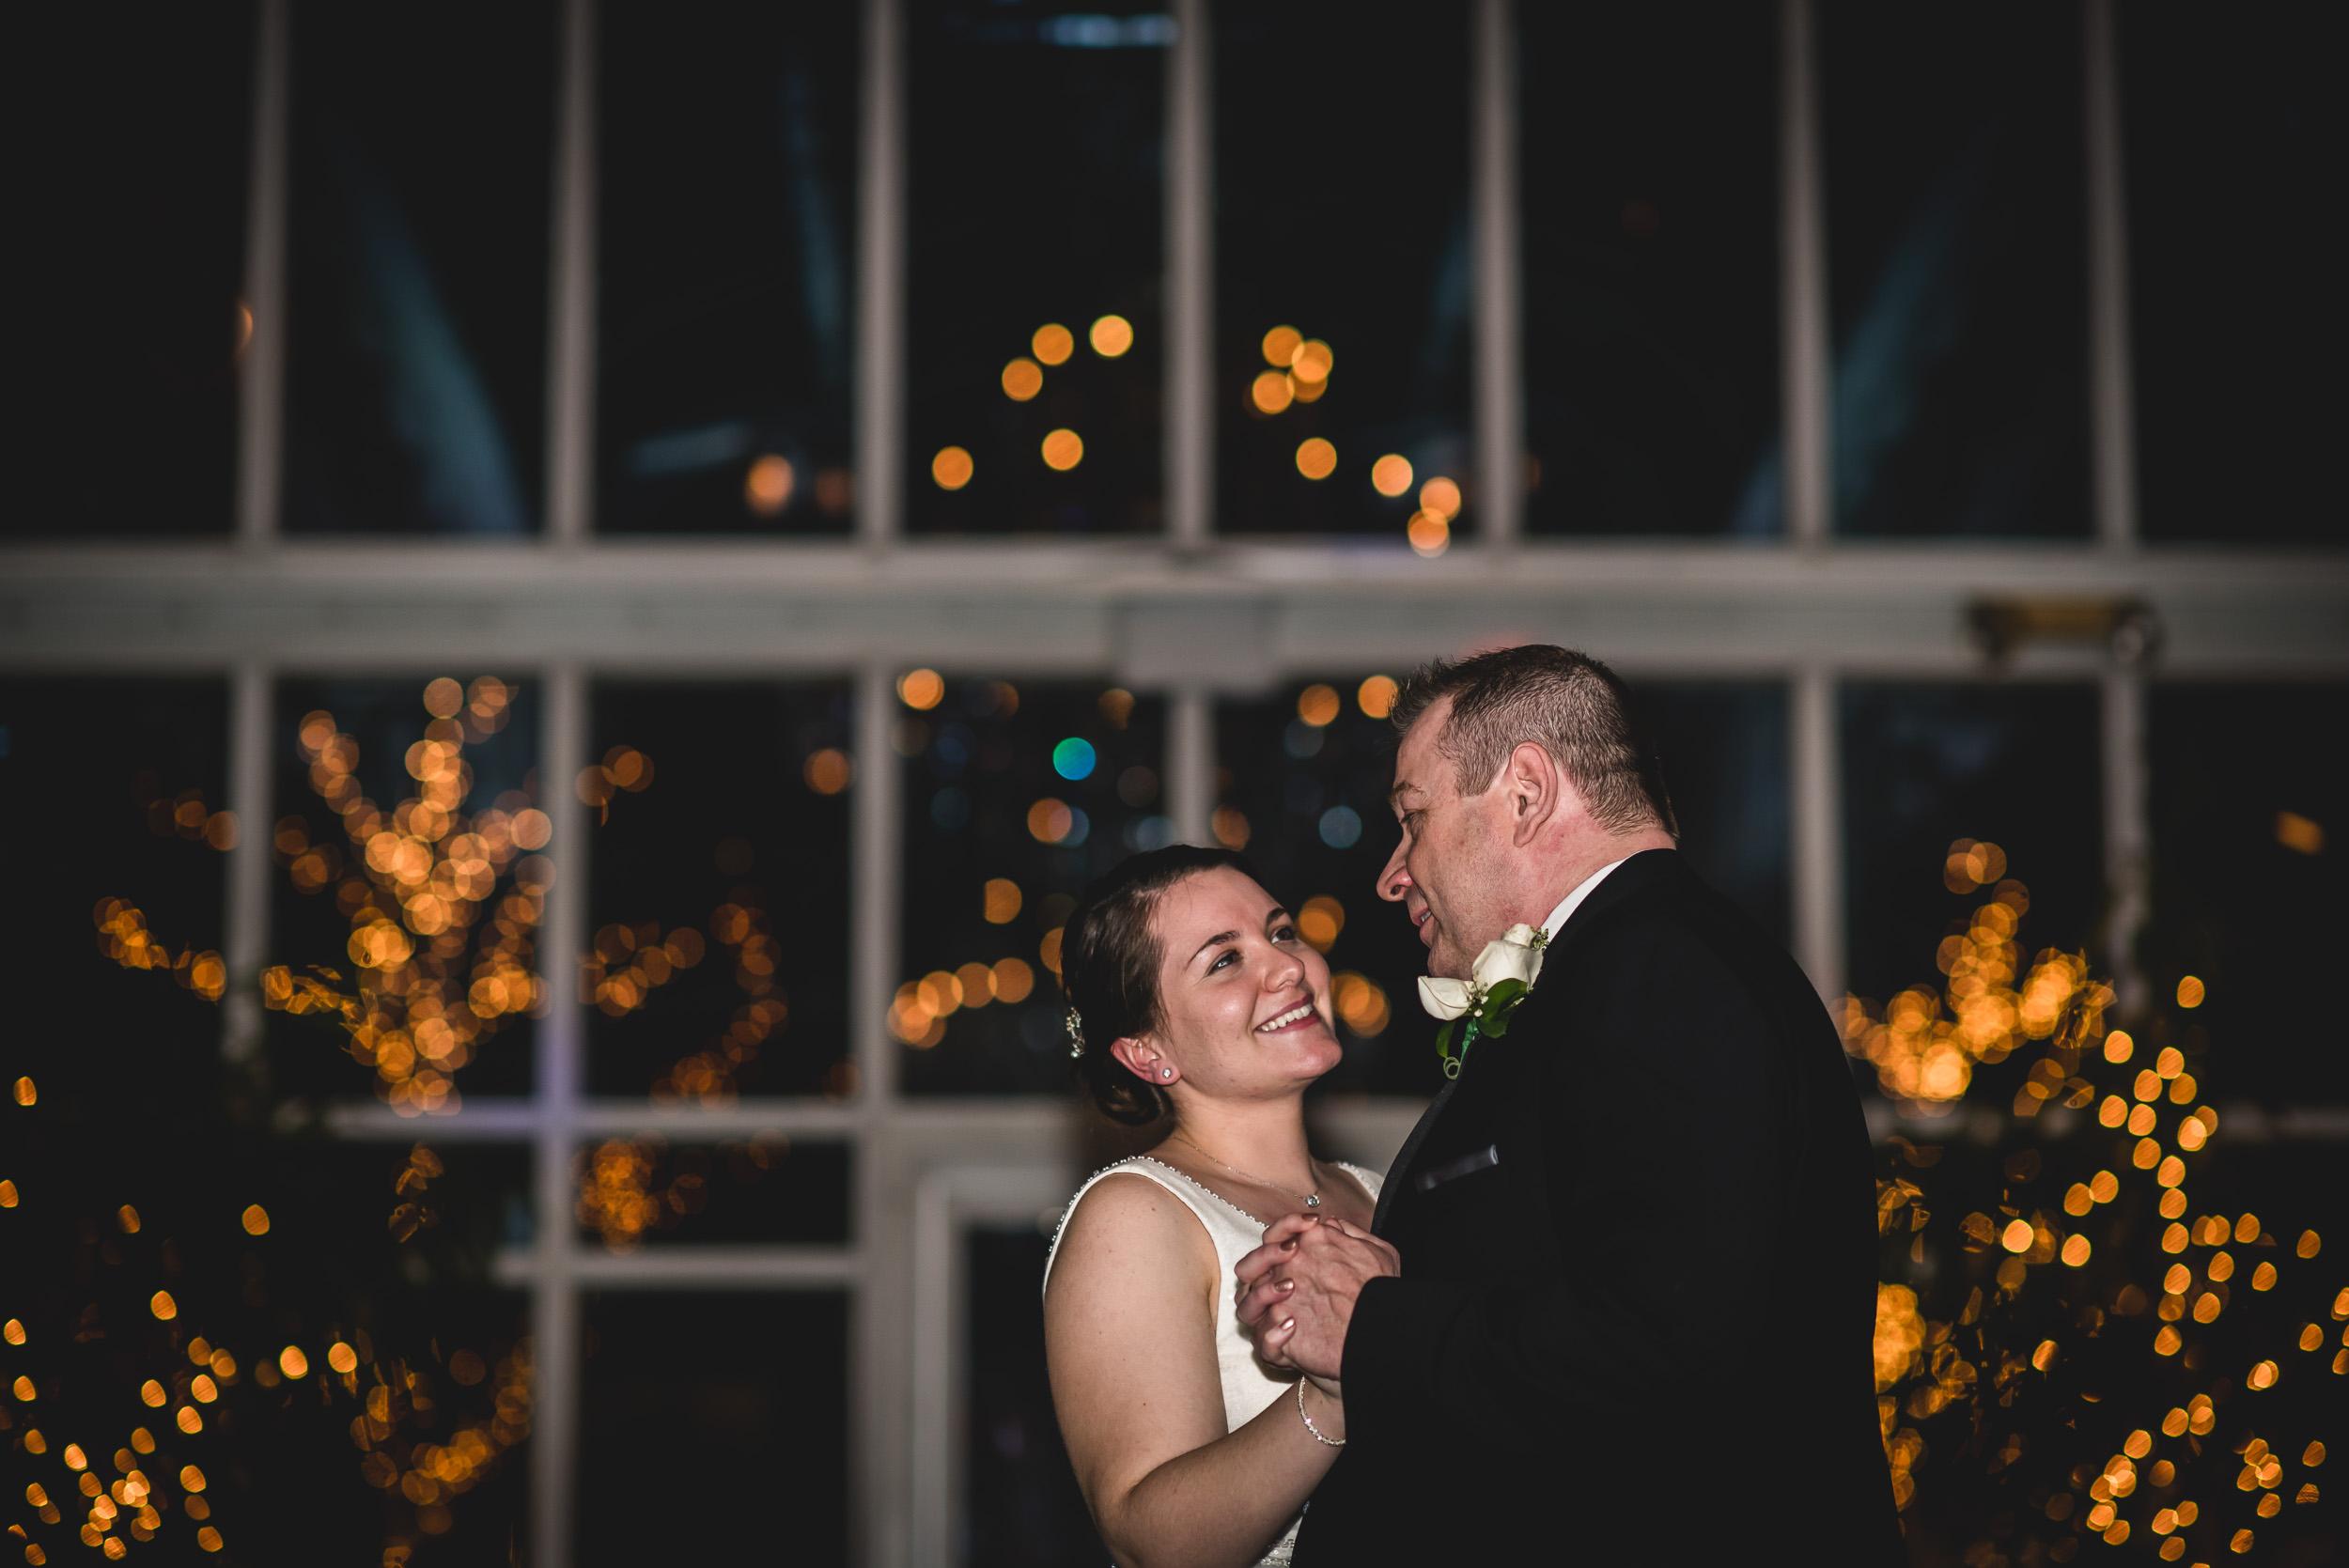 katie_mathia_wedding_Church_assumption_madison_hotel_morristown_new_jersey(4of1).jpg